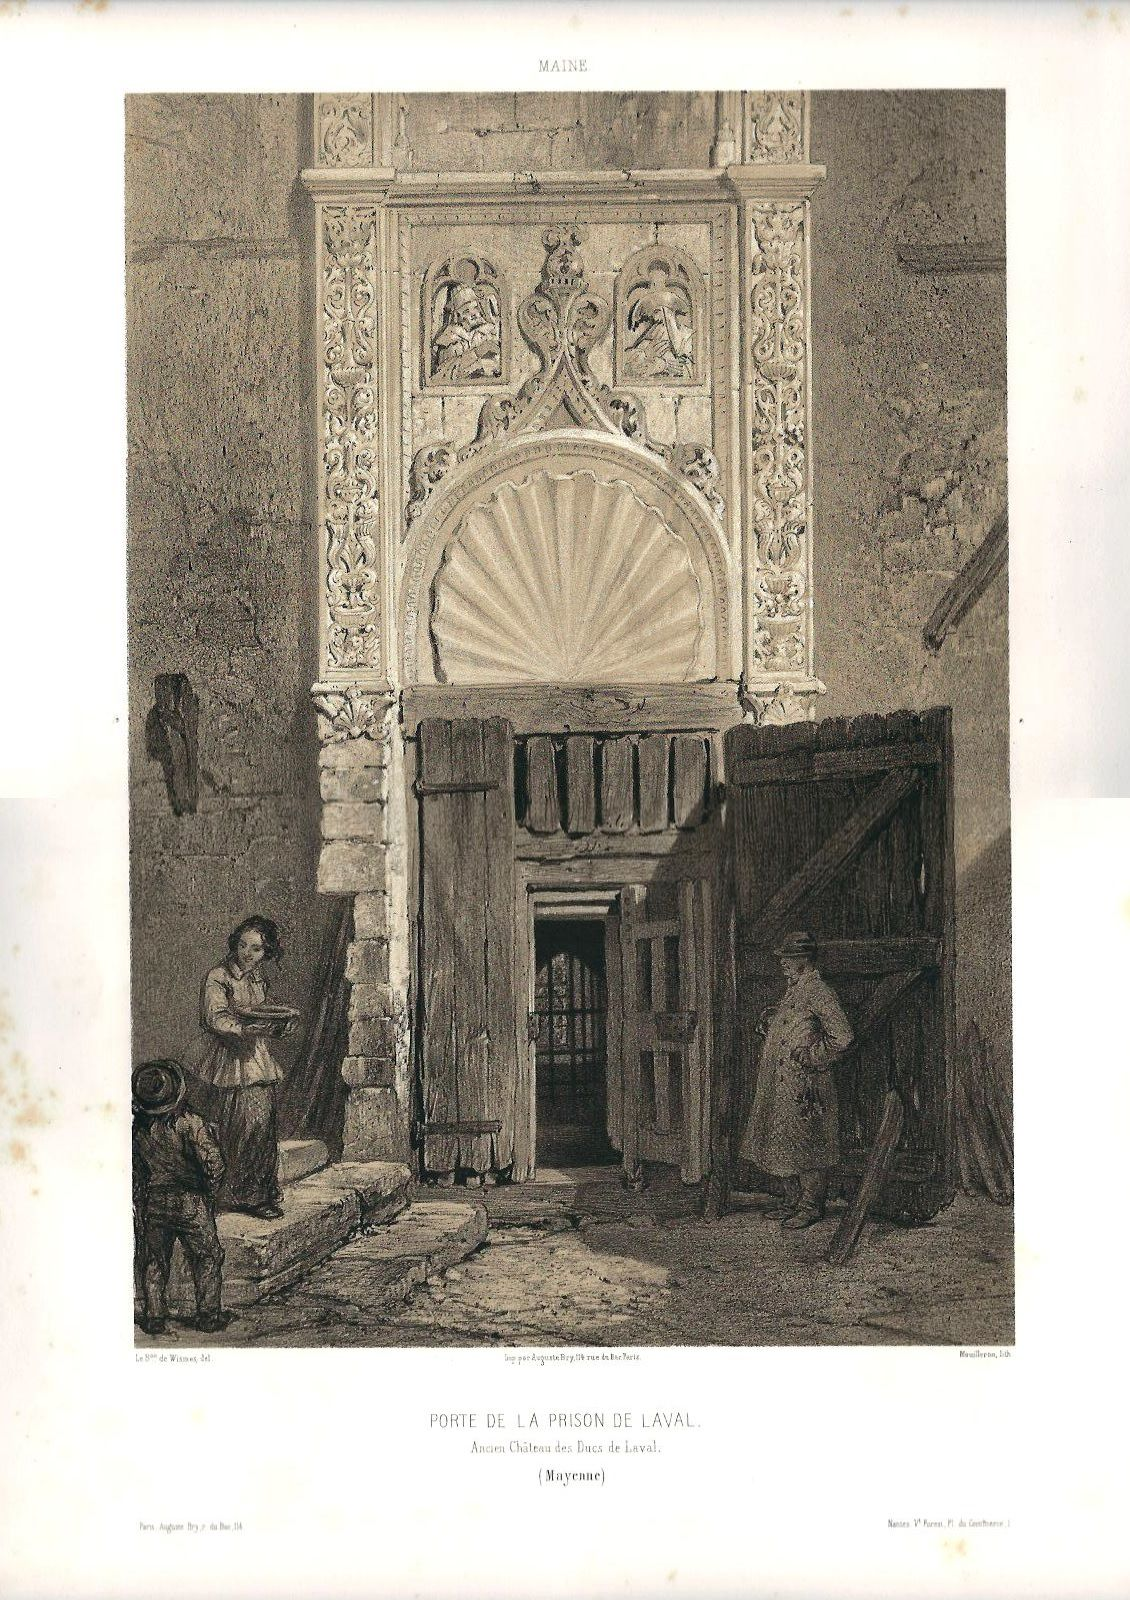 Porte de wismes.JPG (1130×1600)